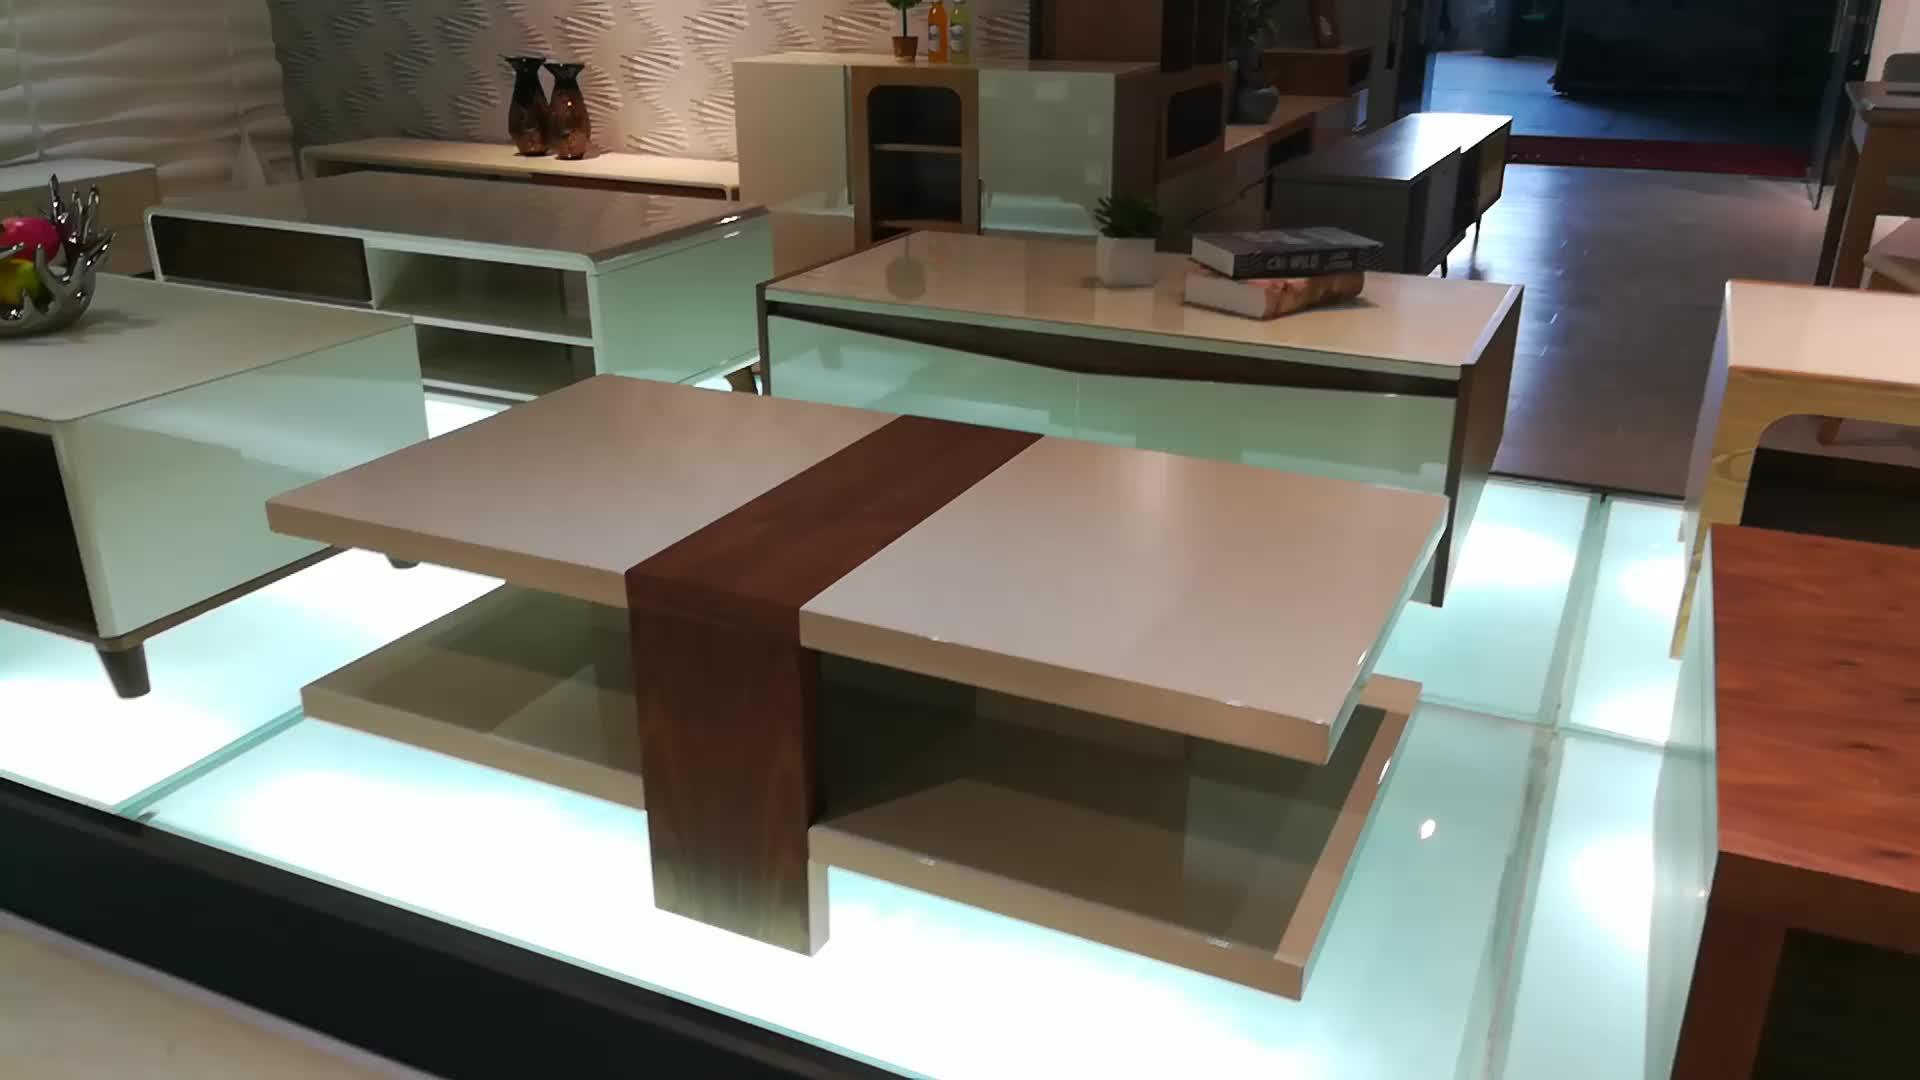 Living room furniture modern wood center table j865a buy - Wooden center table for living room ...